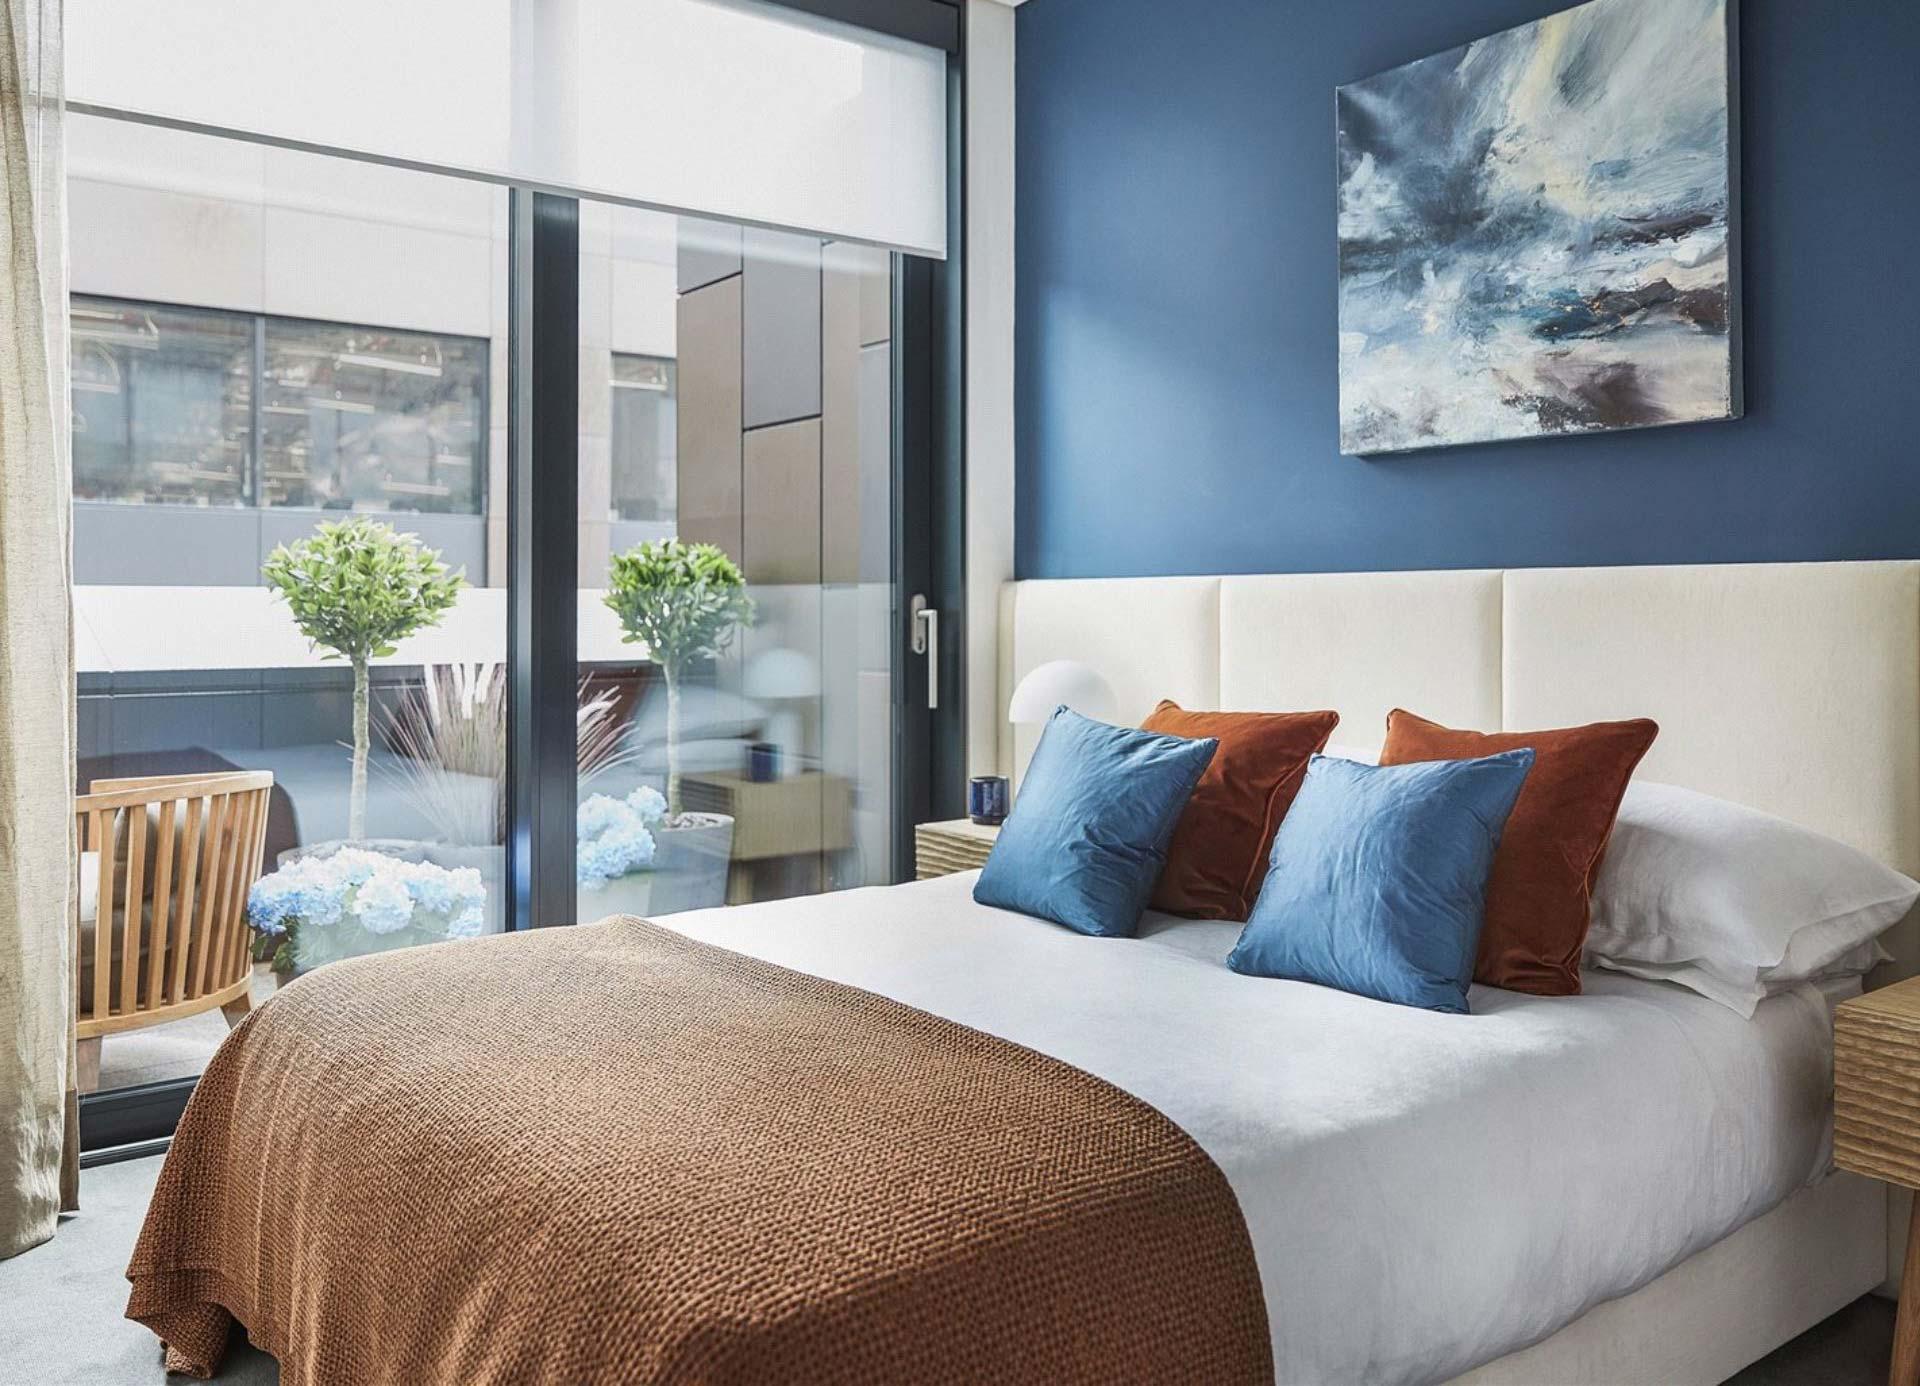 Four-bedroom Apartment Rathbone Square Fitzrovia London